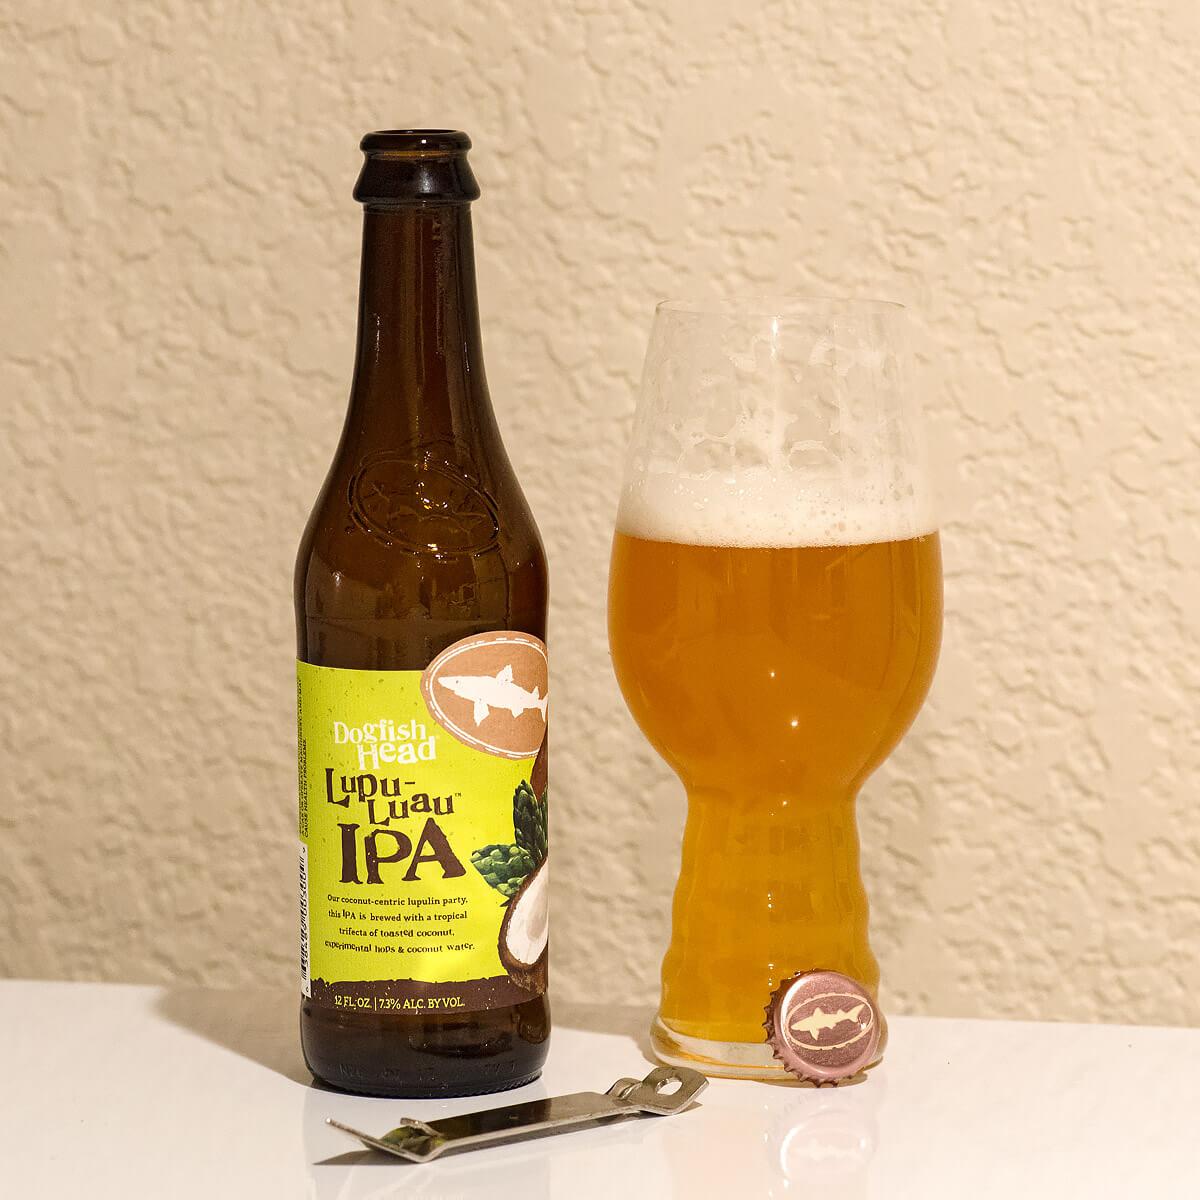 Lupu-Luau American IPA by Dogfish Head Craft Brewery